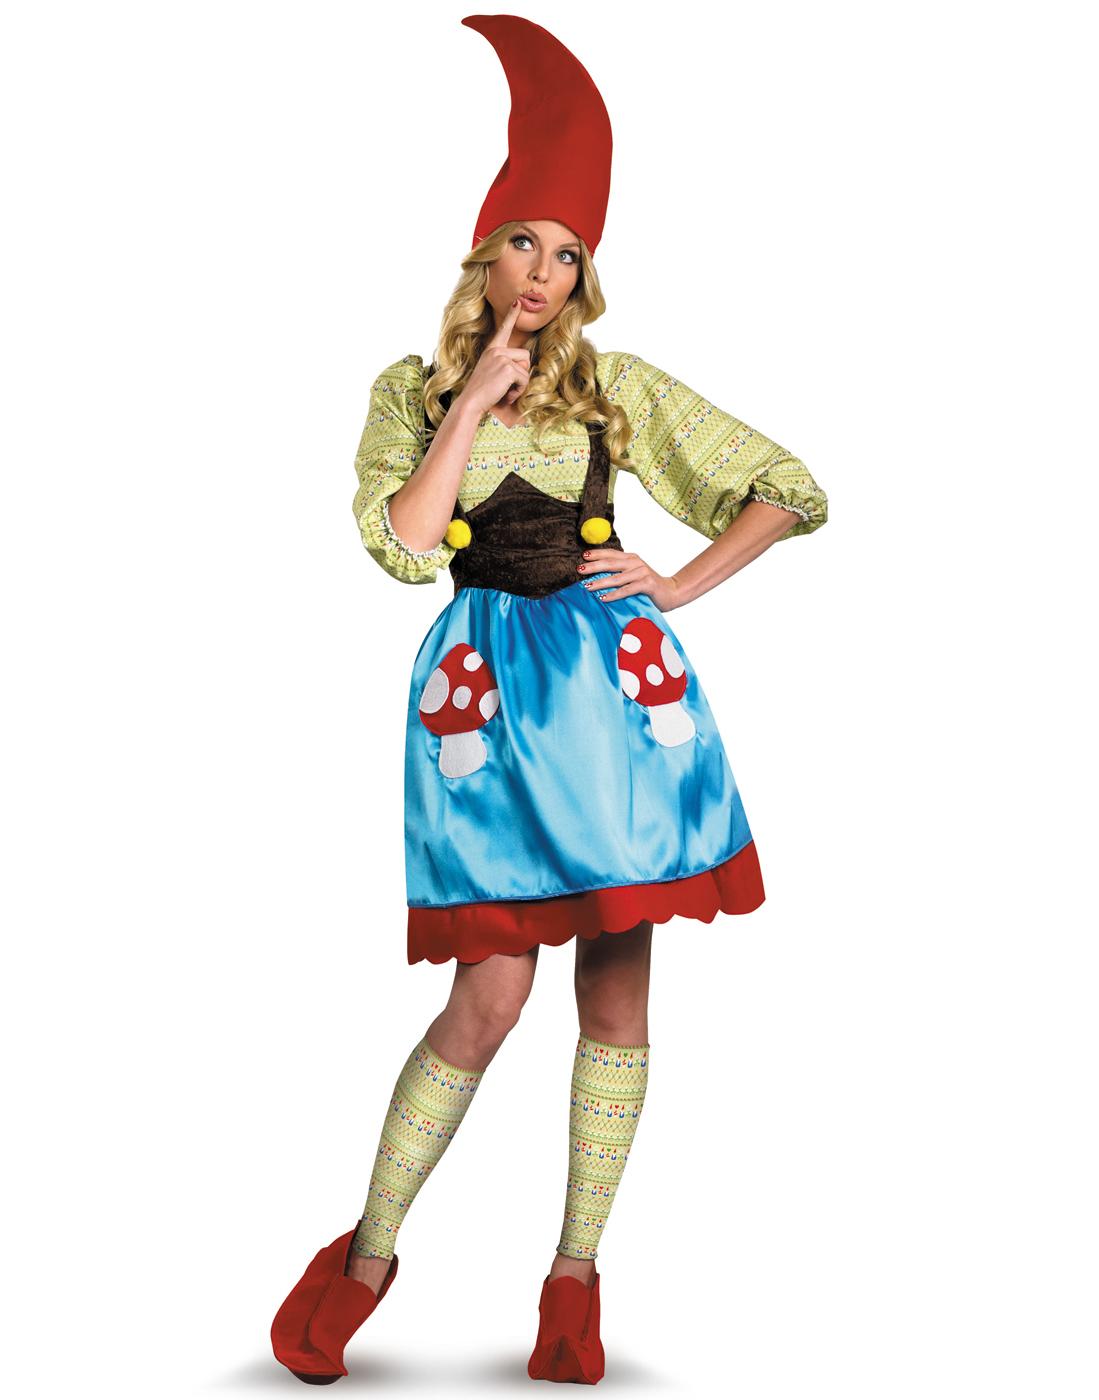 Ms-Gnome-Sexy-Smurf-Garden-Gnome-Fancy-Dress-Halloween-Costume-Womens-4-20